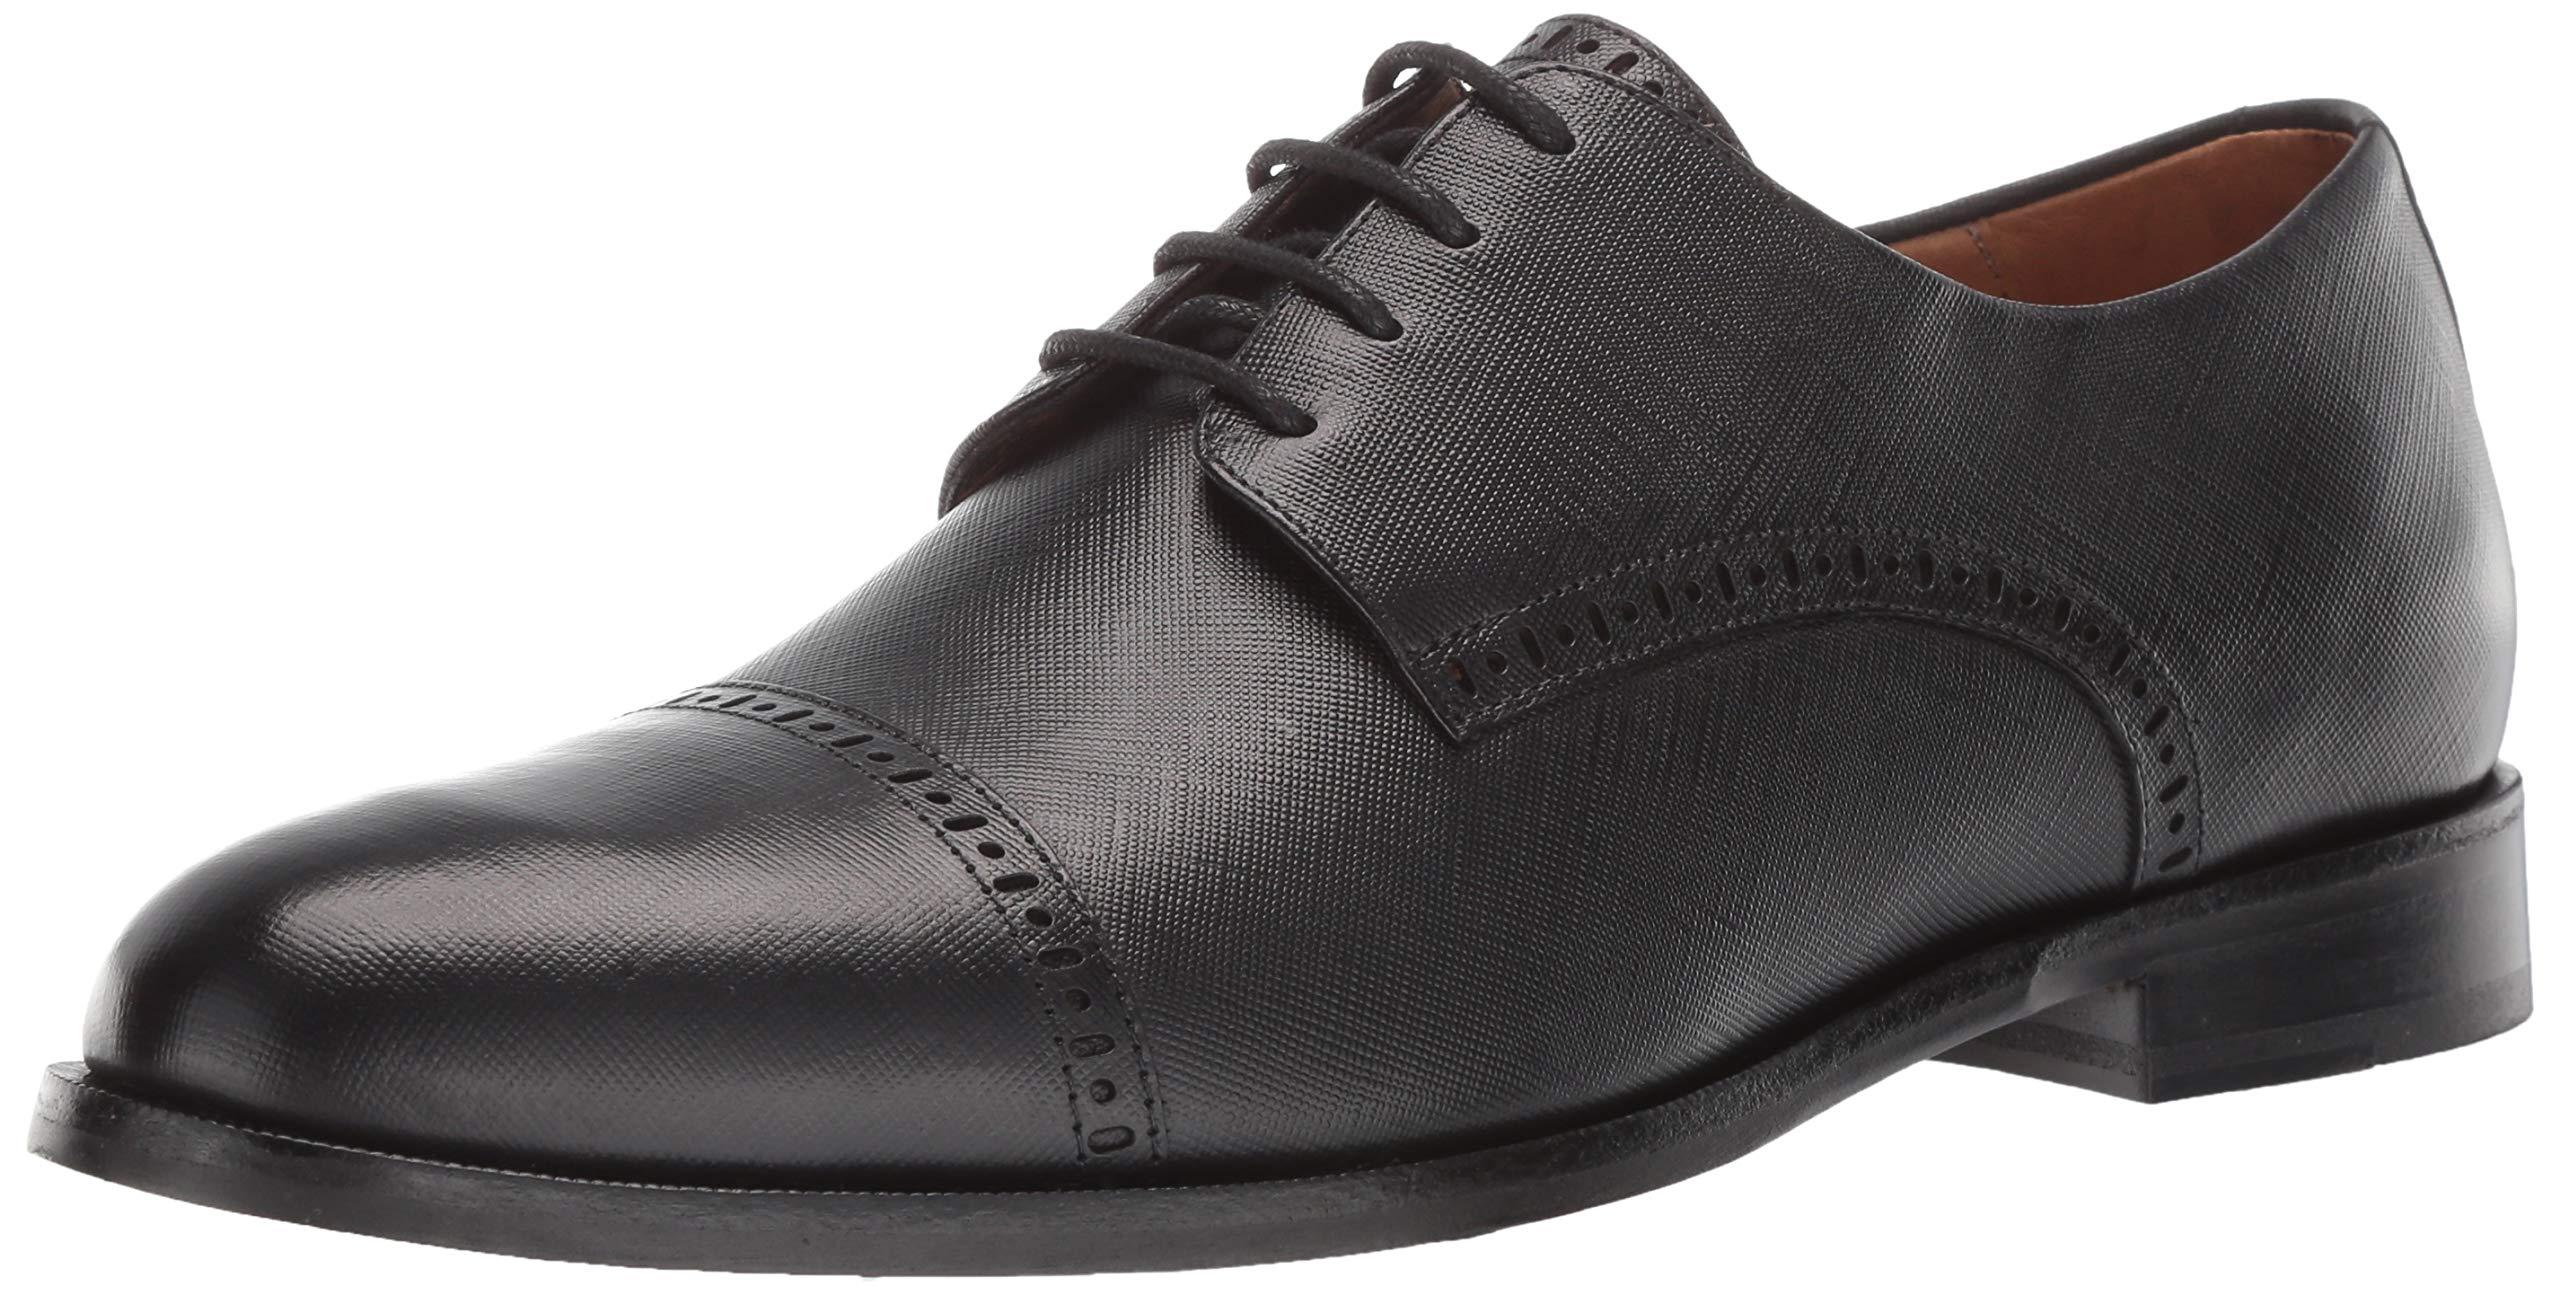 MARC JOSEPH NEW YORK Men's Leather Oxford Lace-up Dress Shoe